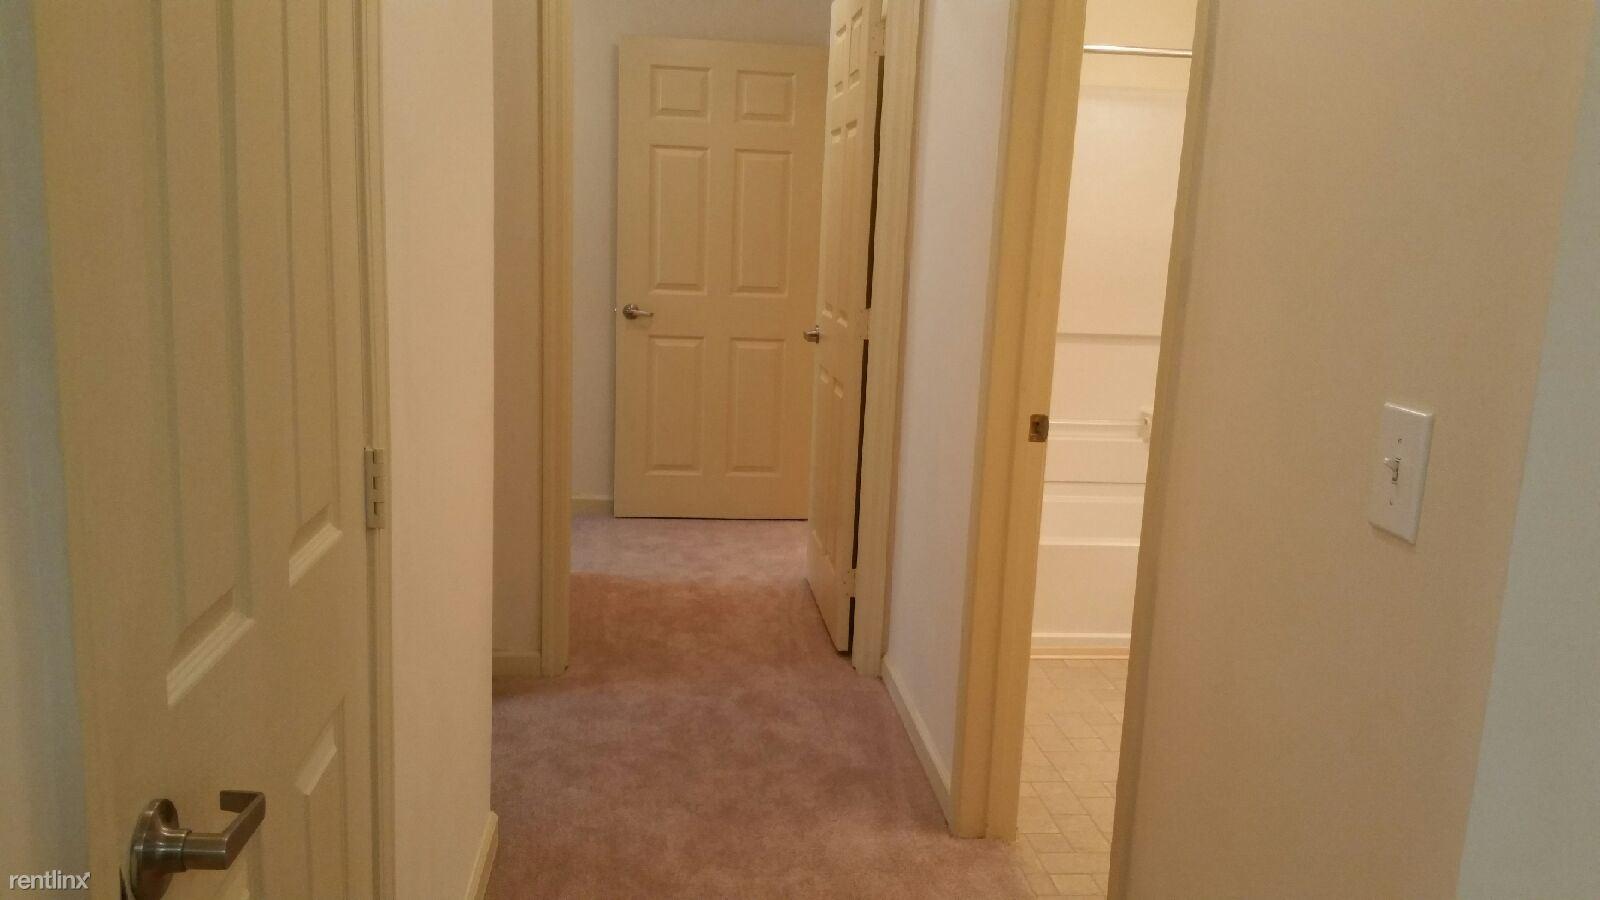 2 BEDROOM HALL